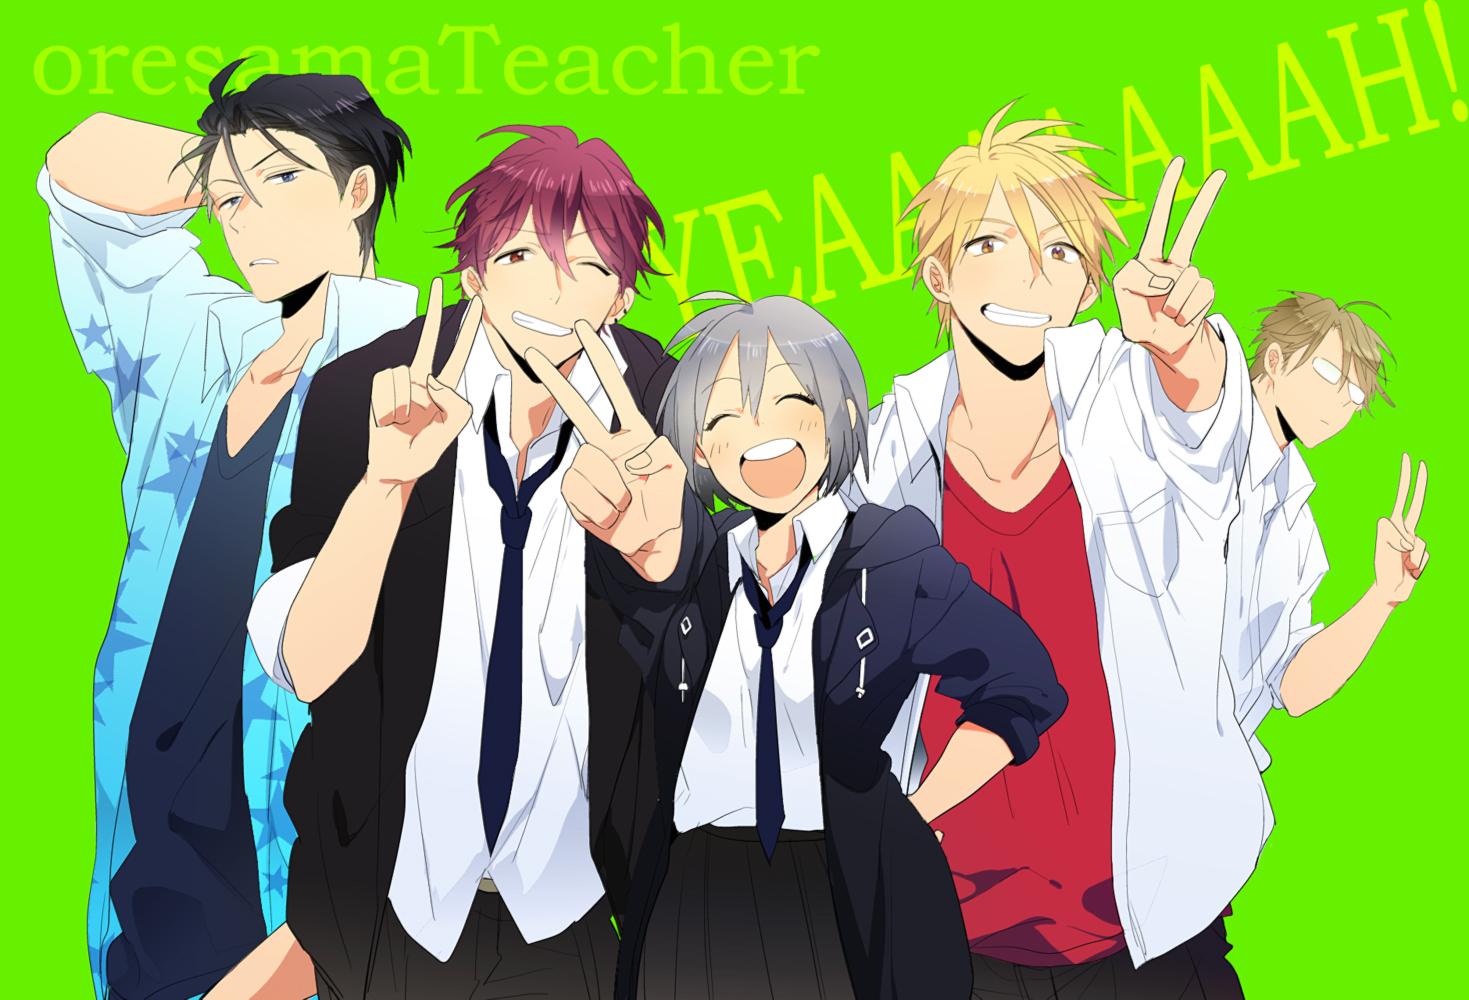 Tags: Pixiv, Oresama Teacher, Kurosaki Mafuyu, Hayasaka (Oresama Teacher), Okegawa Kyoutarou, Yui Shinobu, Shibuya Aki, Pixiv Id 8269300